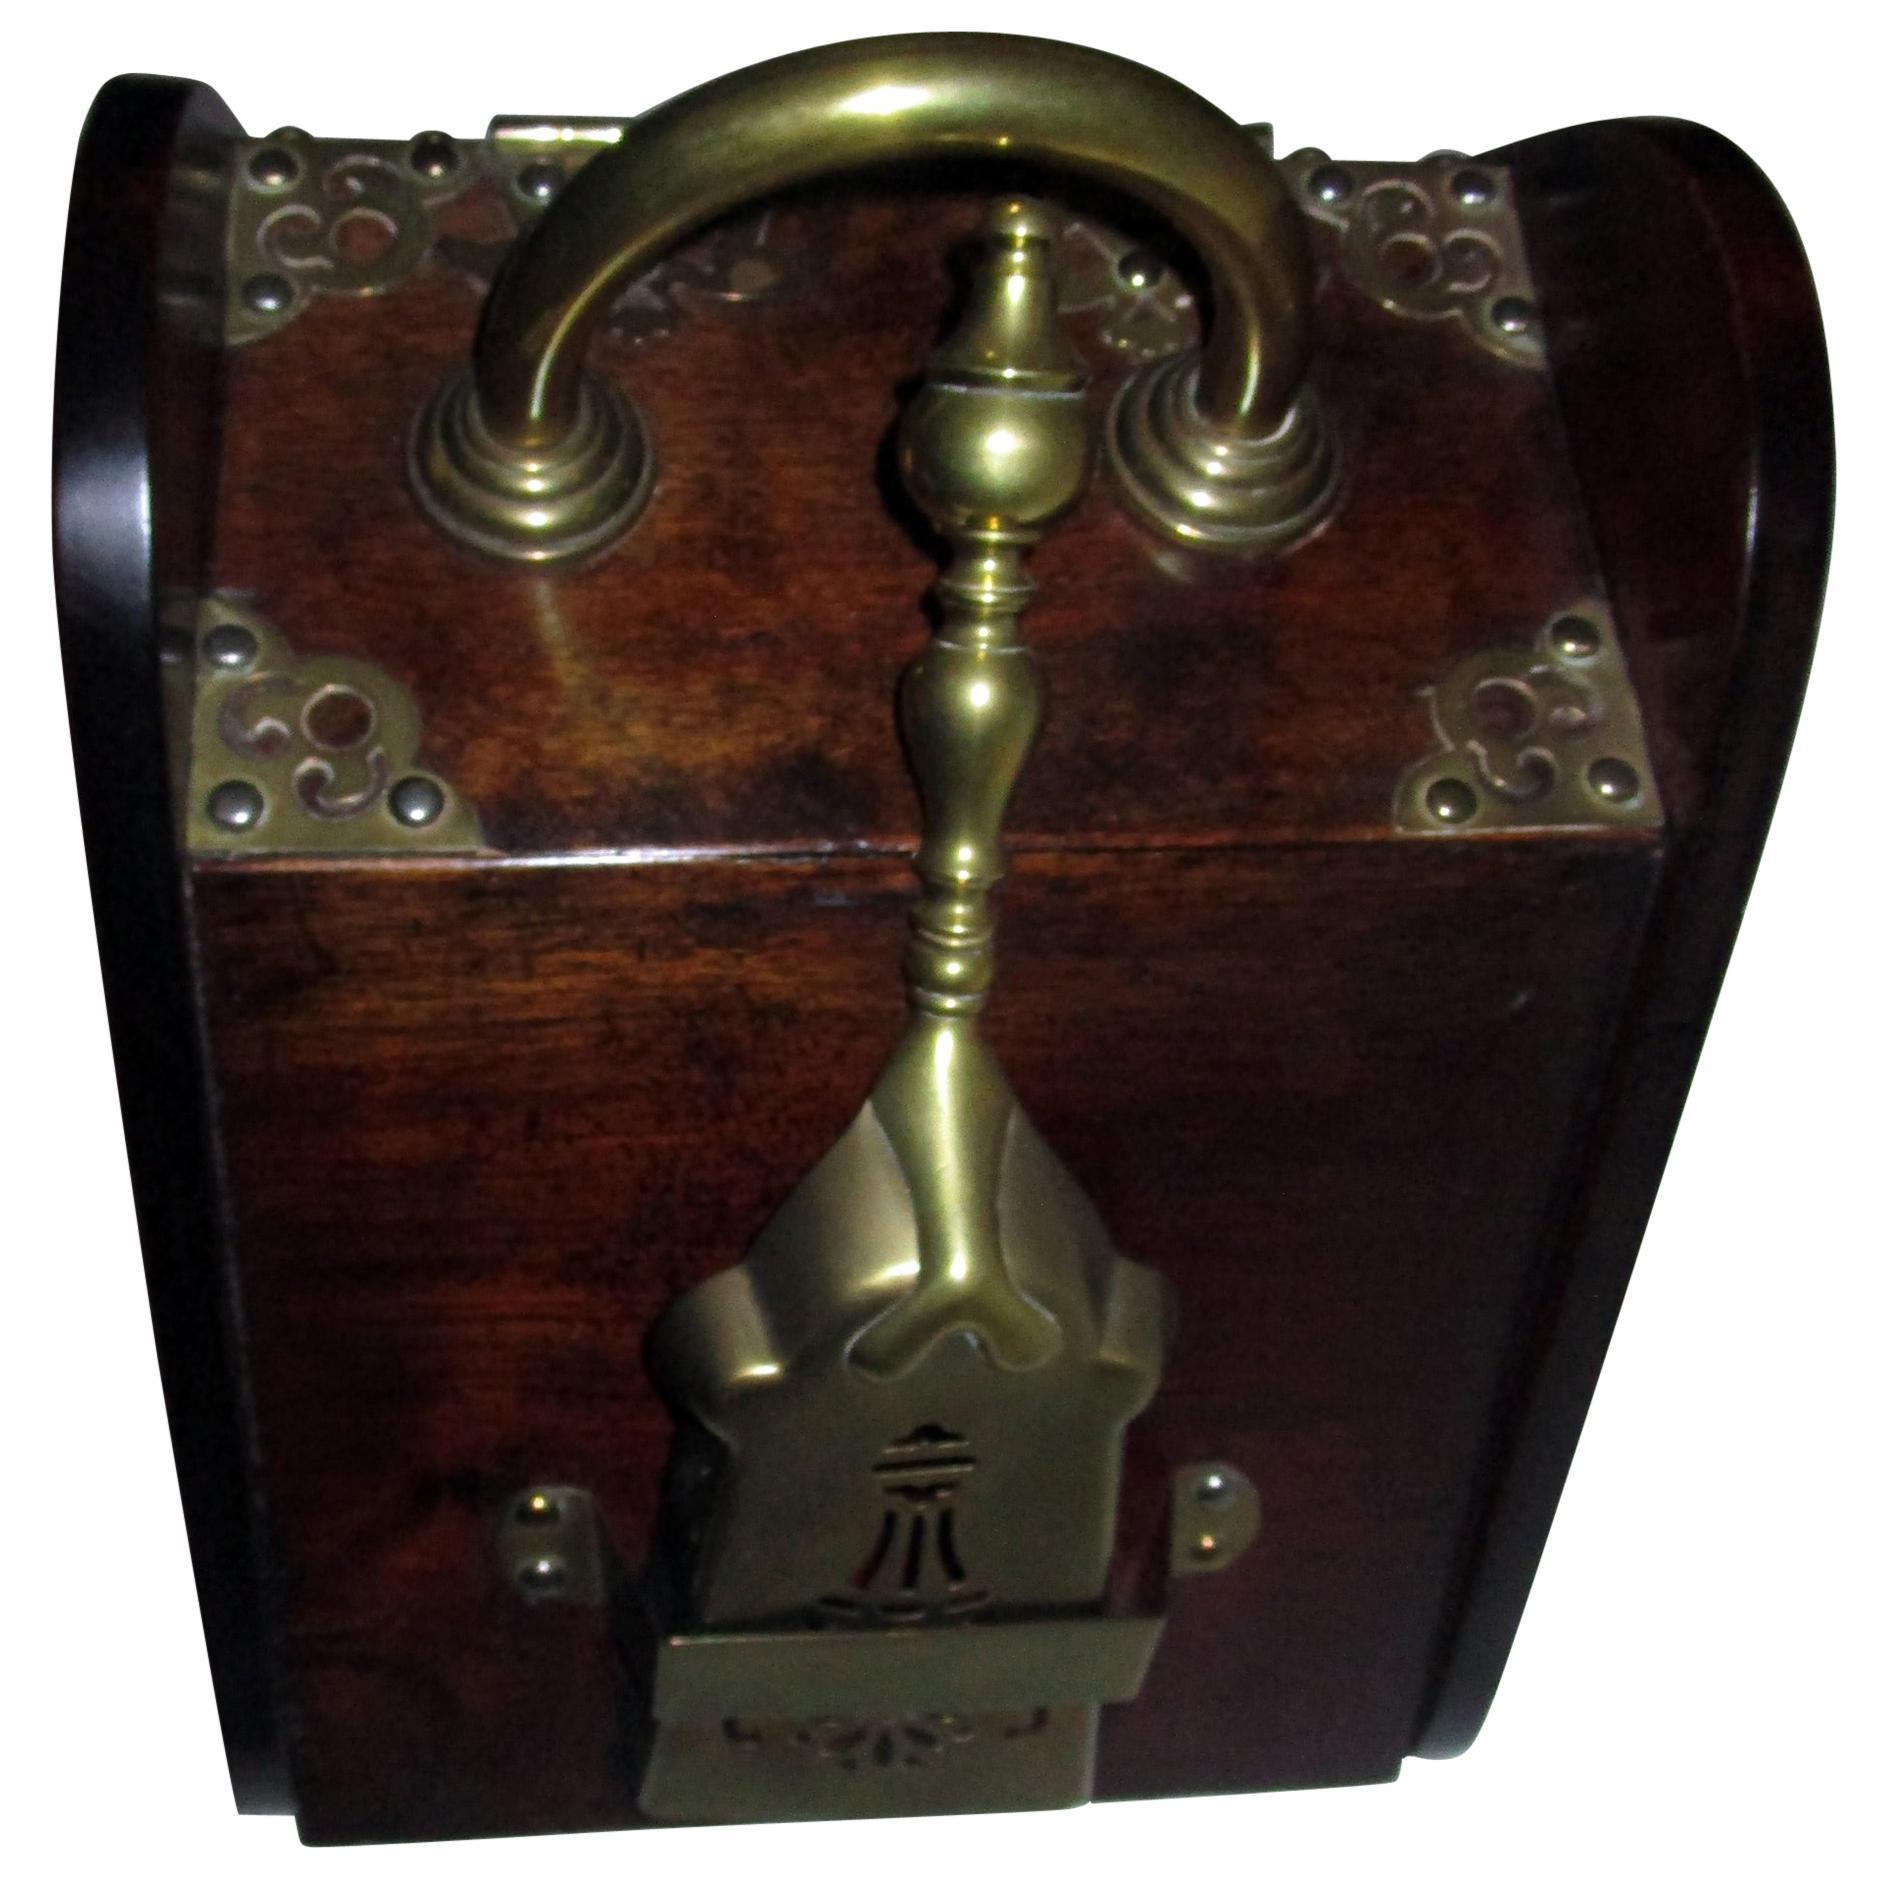 19th century Mahogany Scottish Coal Scuttle with Heavy Brass Ornamentation